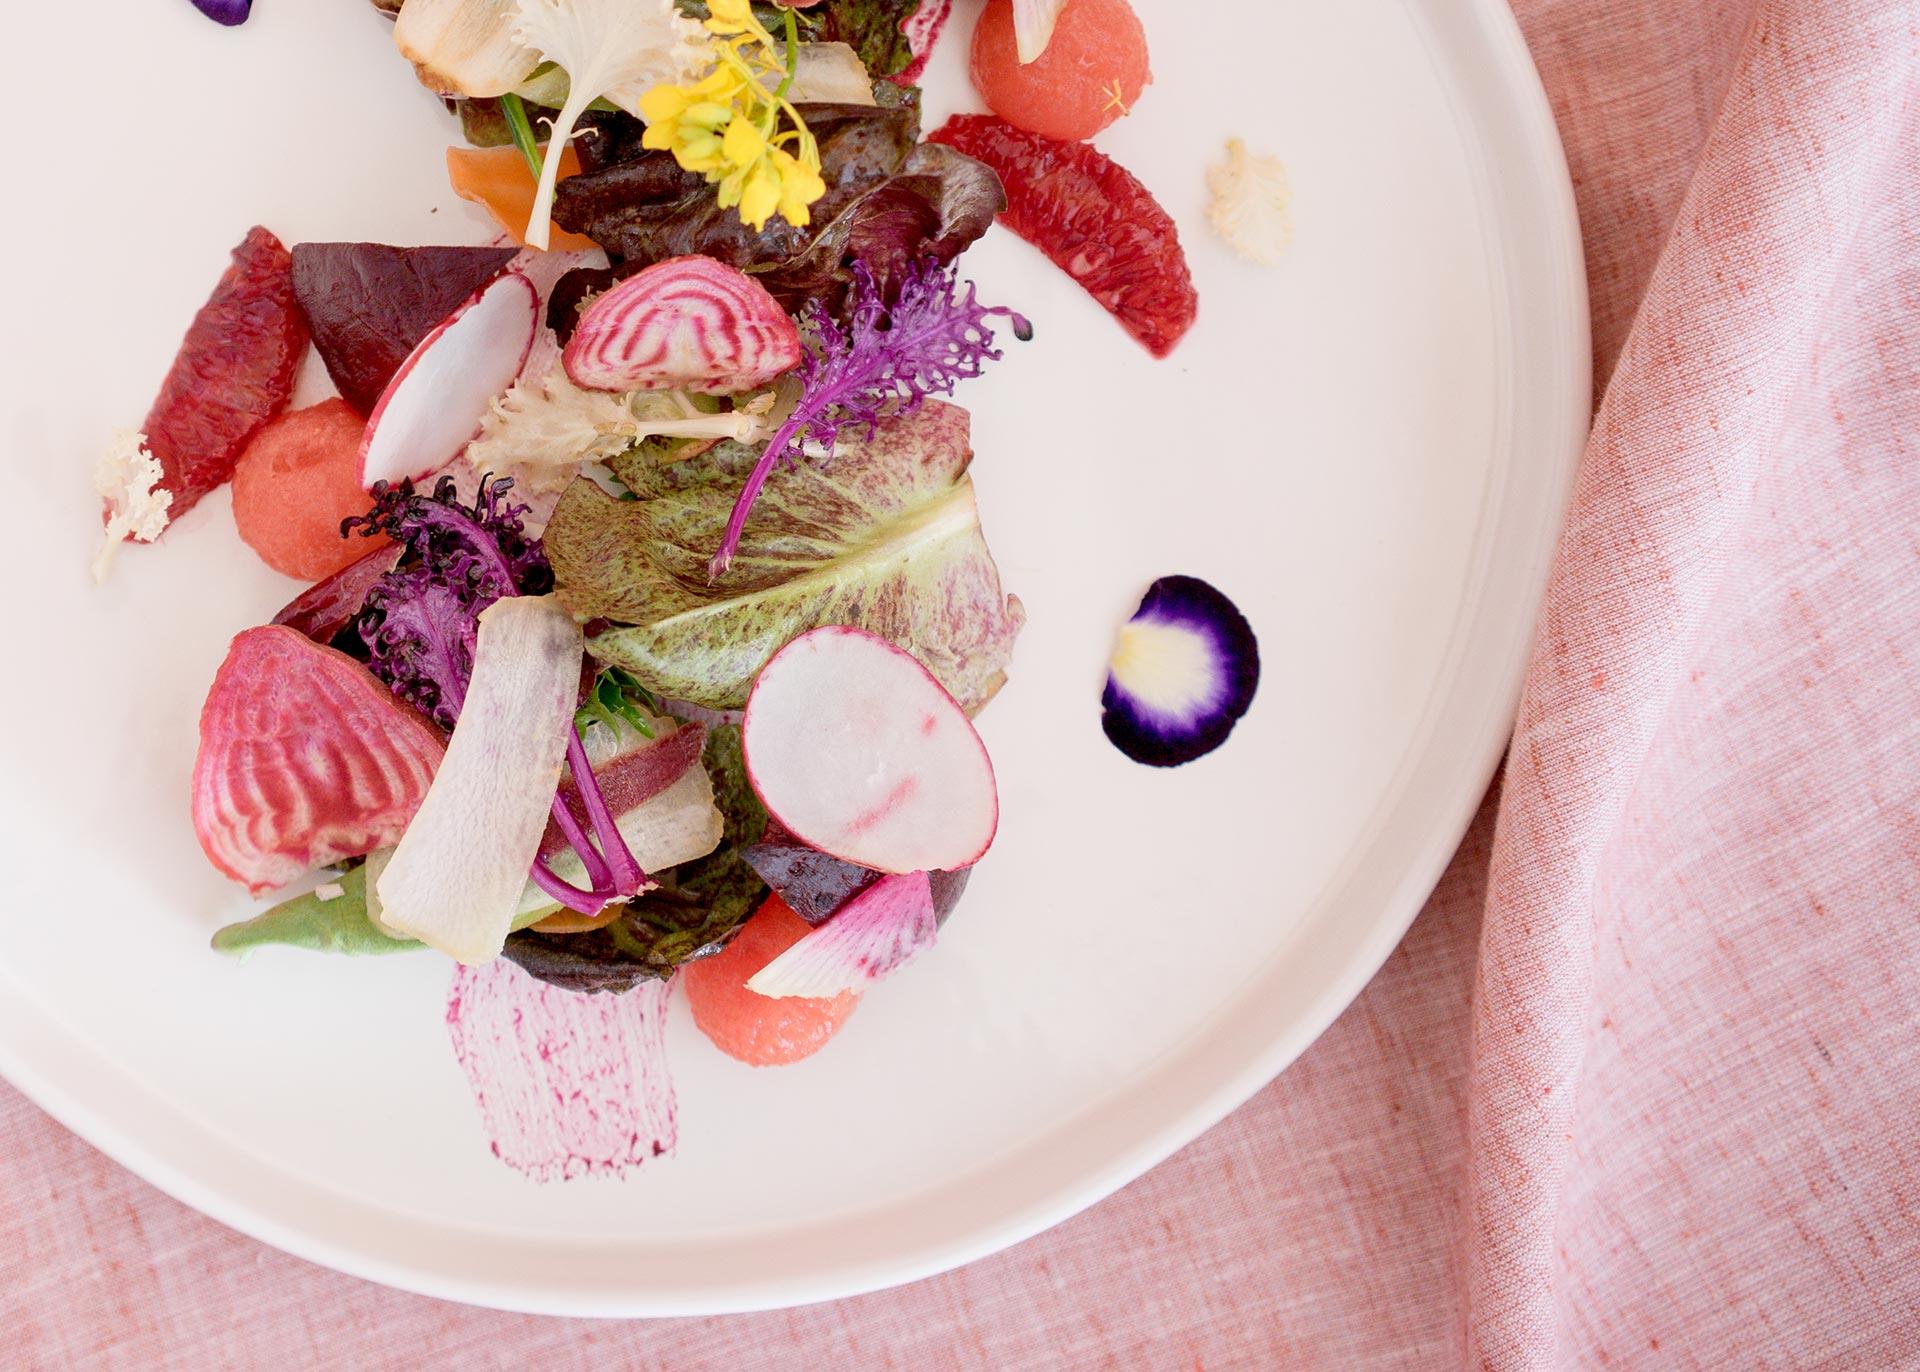 keeva-sf-restaurant-food-photographer-a-few-good-clicks-44-2.jpg